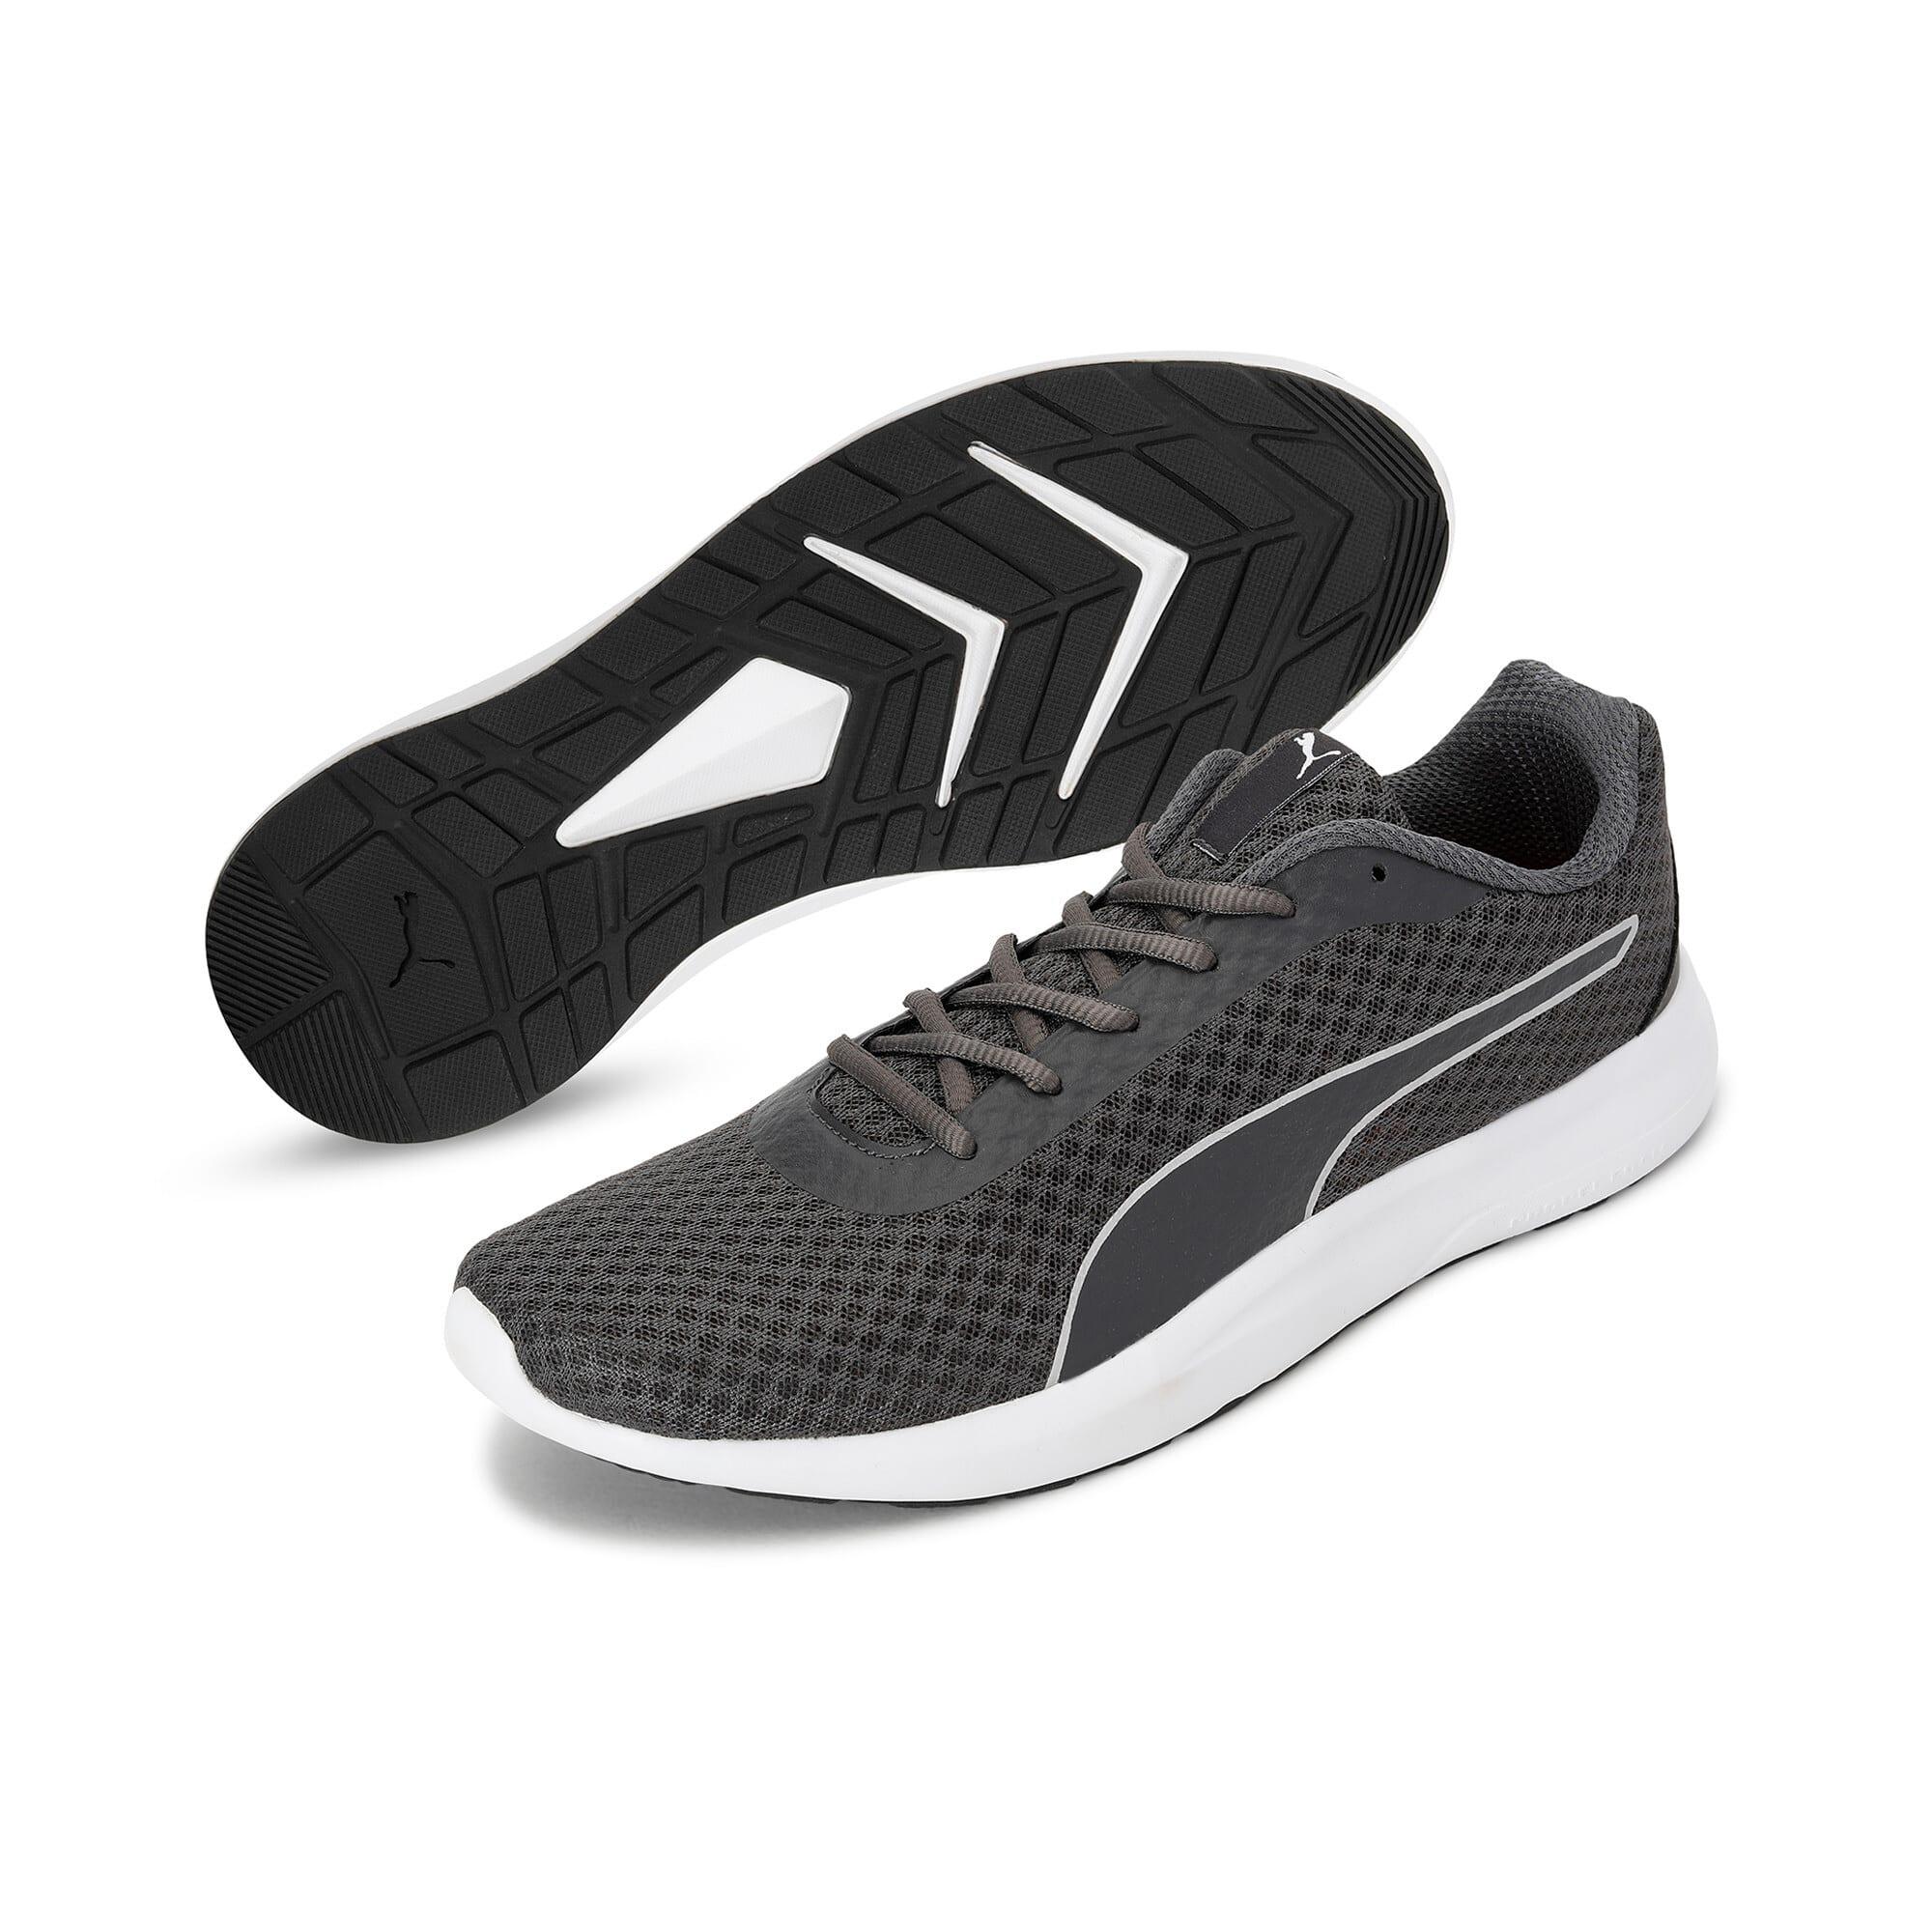 Thumbnail 2 of Propel EL IDP Men's Sportstyle Shoes, Asphalt-Silver-White-Black, medium-IND